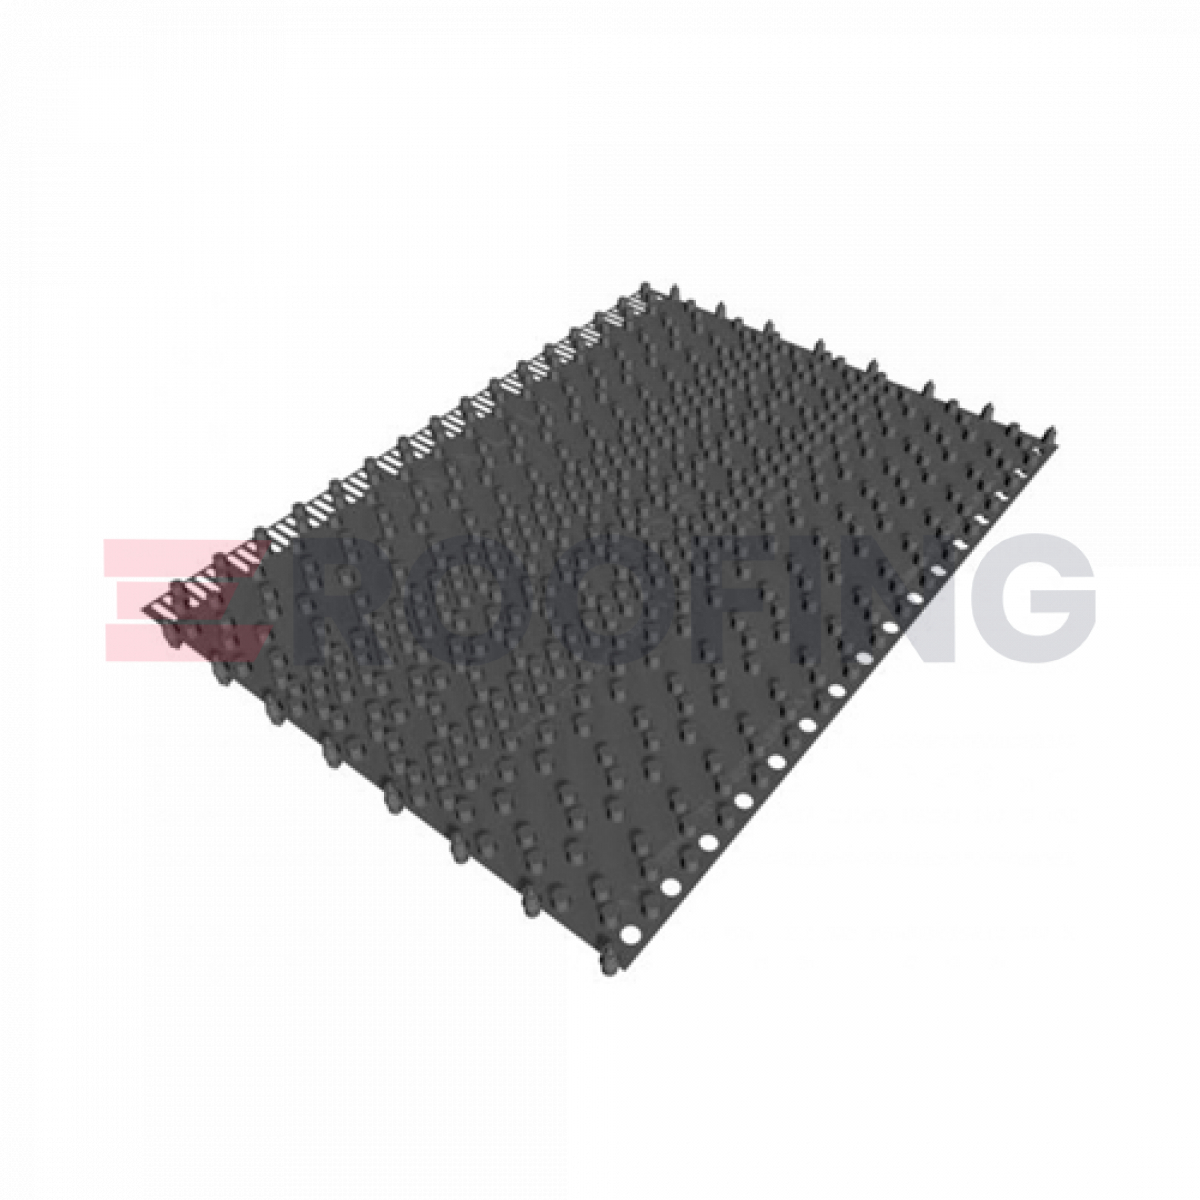 Manthorpe G1105 Flash Vent Ventilating Abutment Flashing - 3m Roll